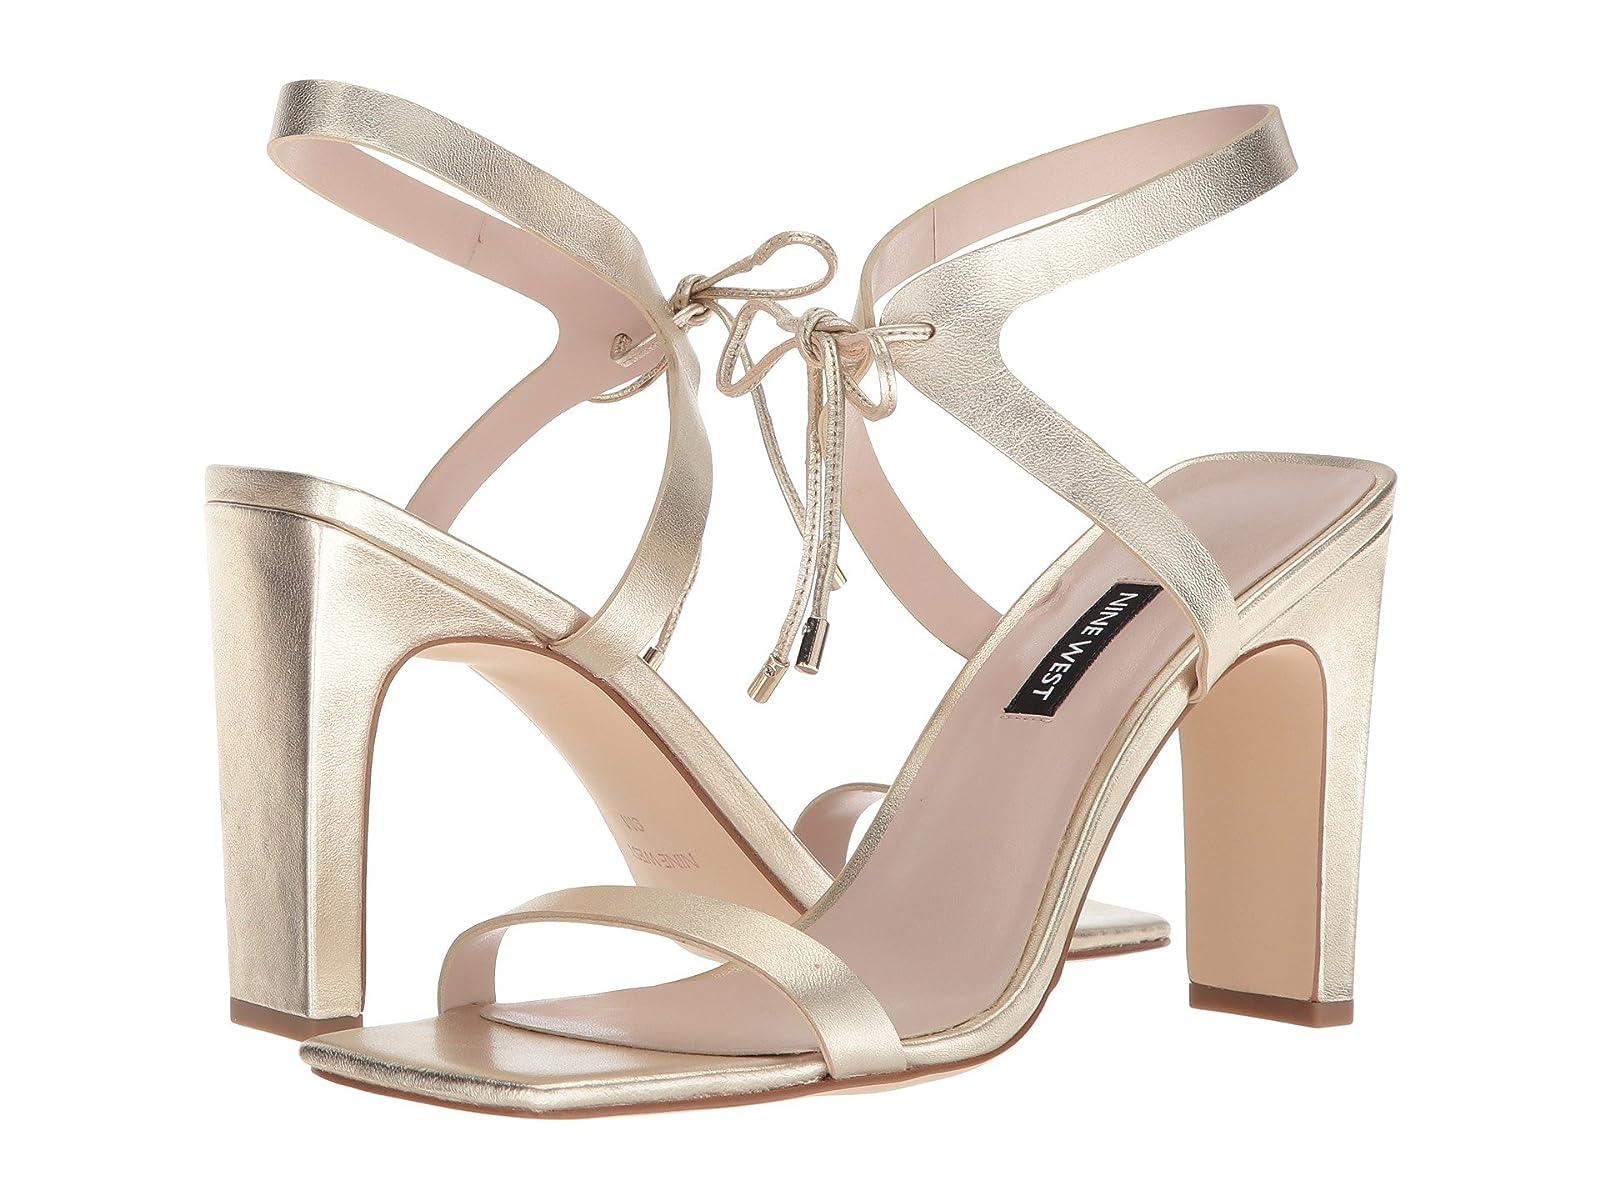 Nine West Longitano Heel SandalCheap and distinctive eye-catching shoes